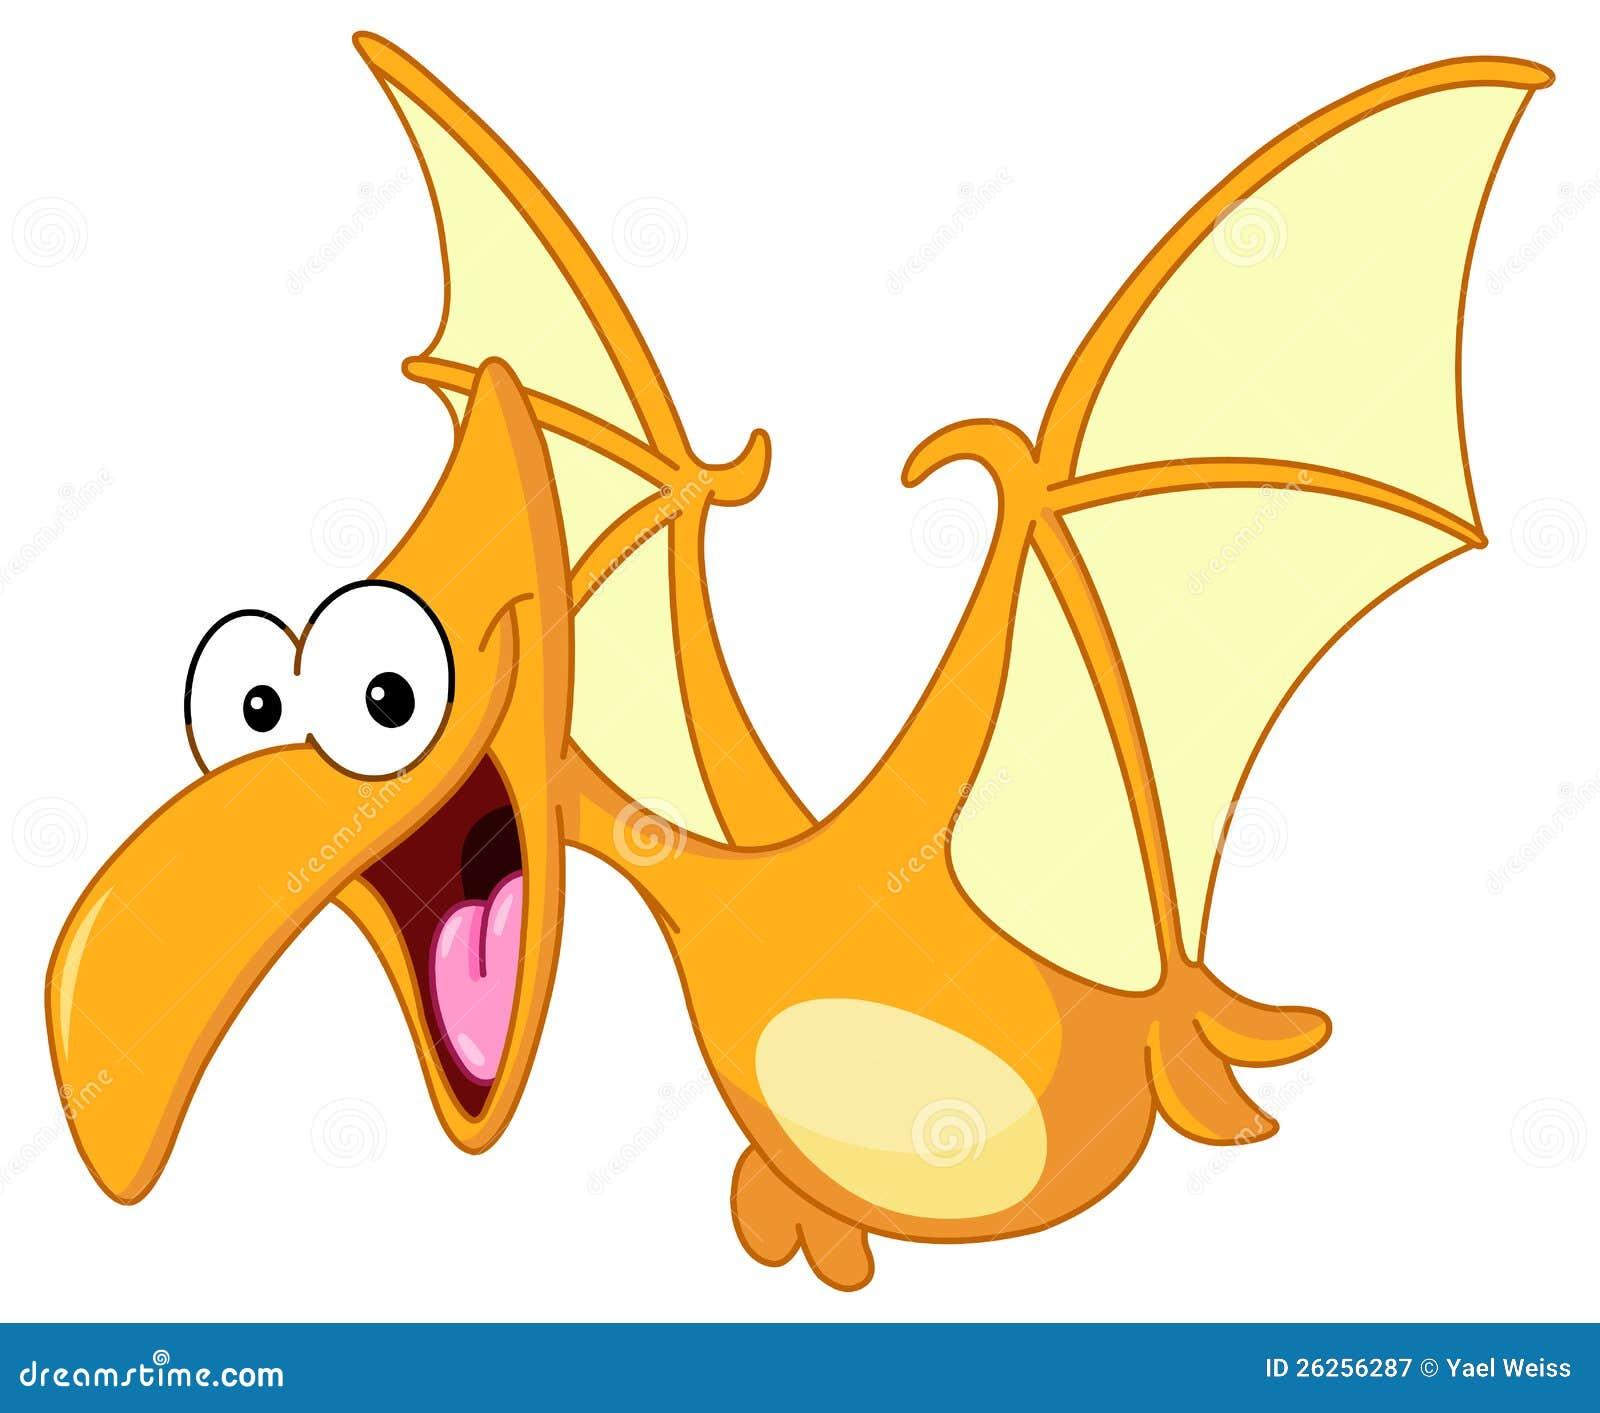 FOX Hunter - A Billionaire Dinosaur Forced Me Gay Pterodactyl-dinosaur-26256287